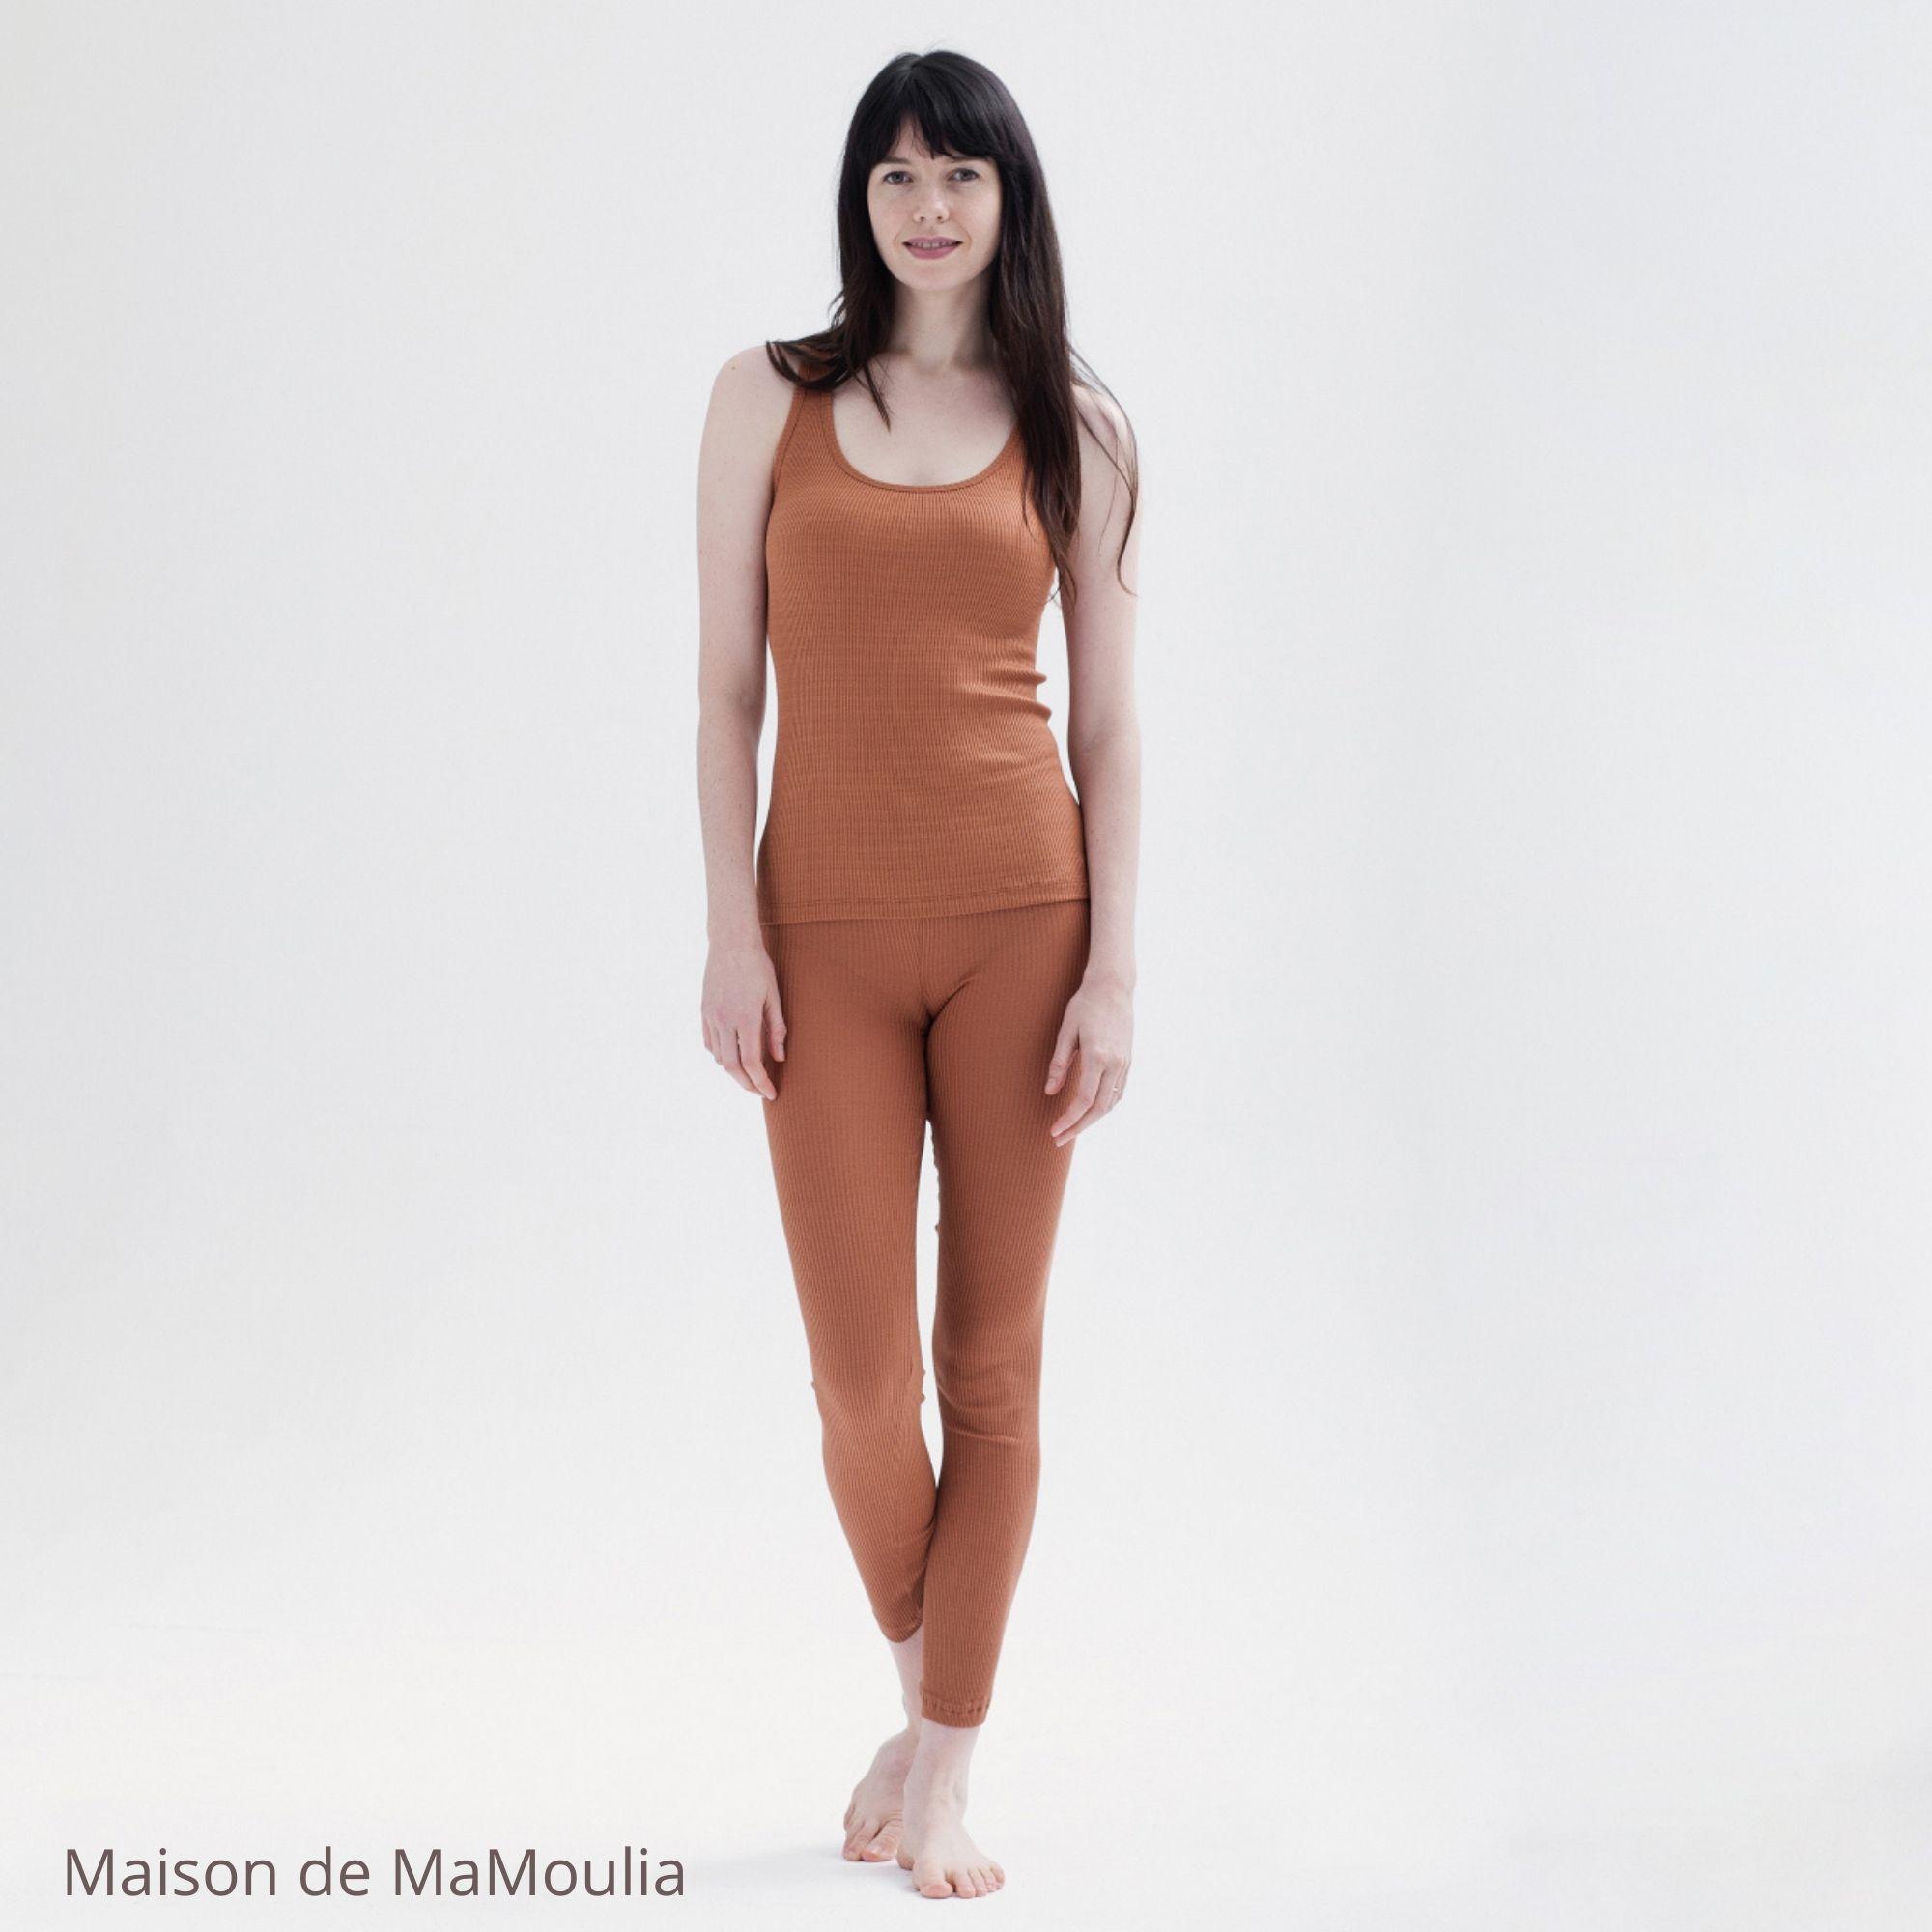 MINIMALISMA - Legging pour femme - Soie 70% / coton 30% - Great - Rooibos